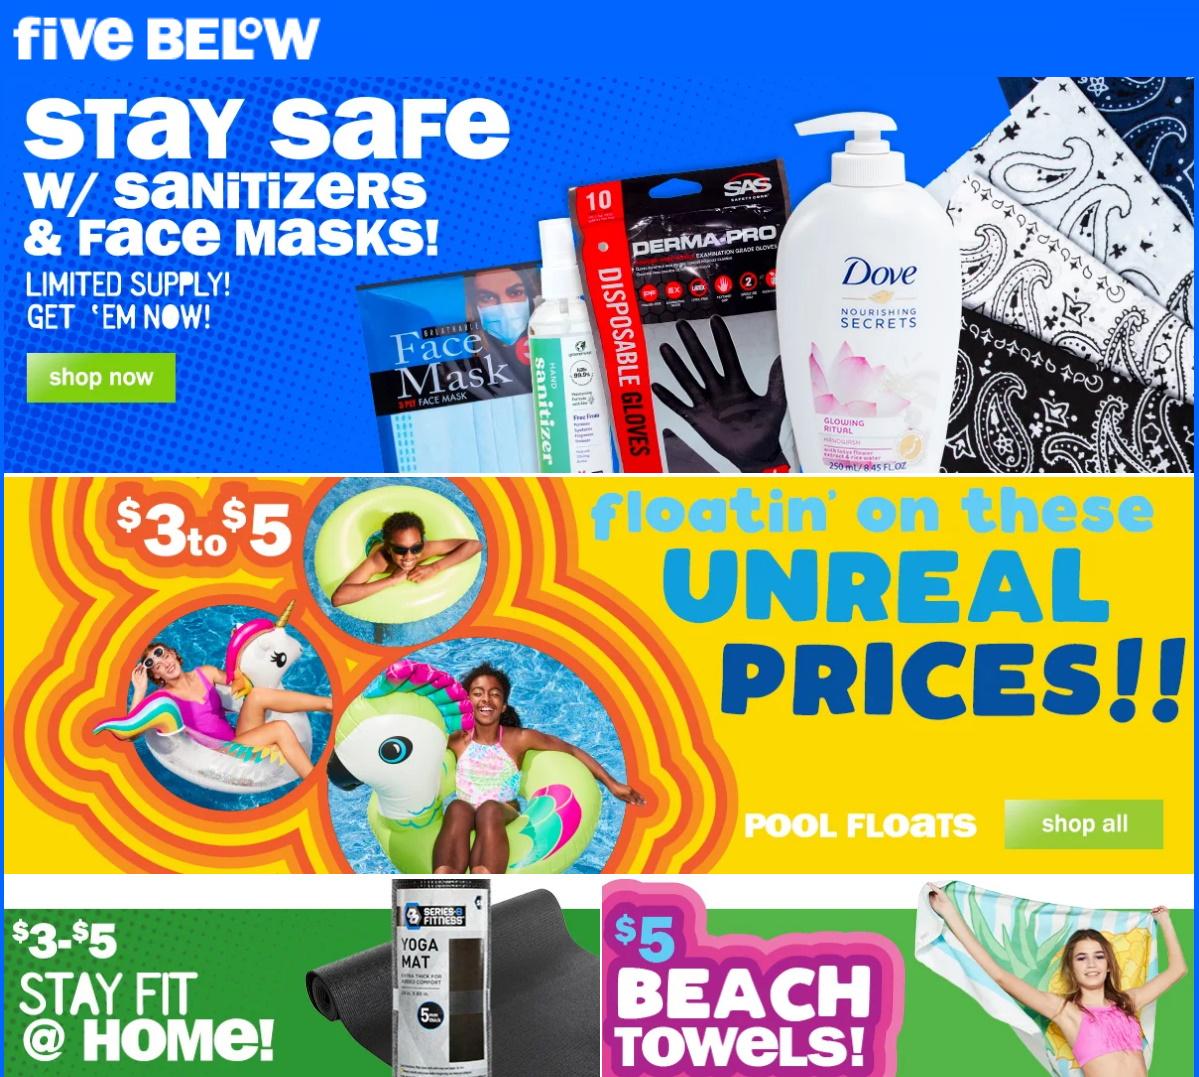 Five Below Weekly Ad Circular - valid 06/03-06/09/2020